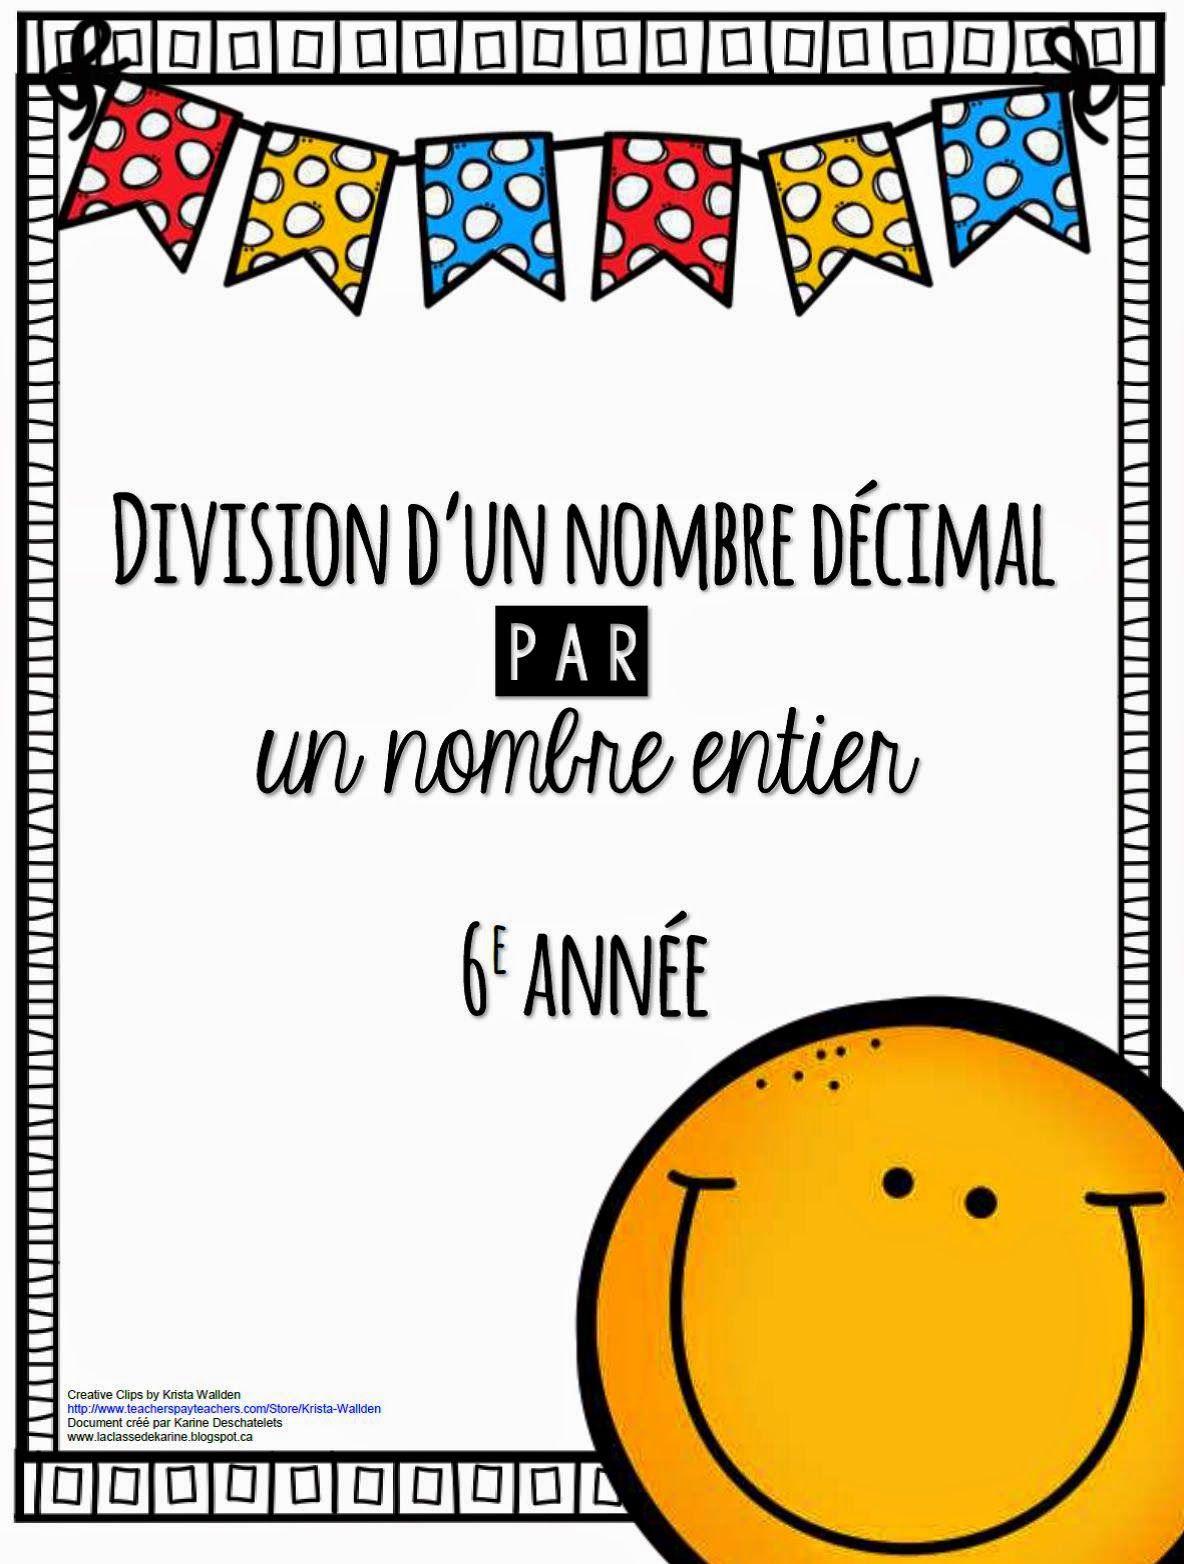 La Classe De Karine La Division D Un Nombre Decimal